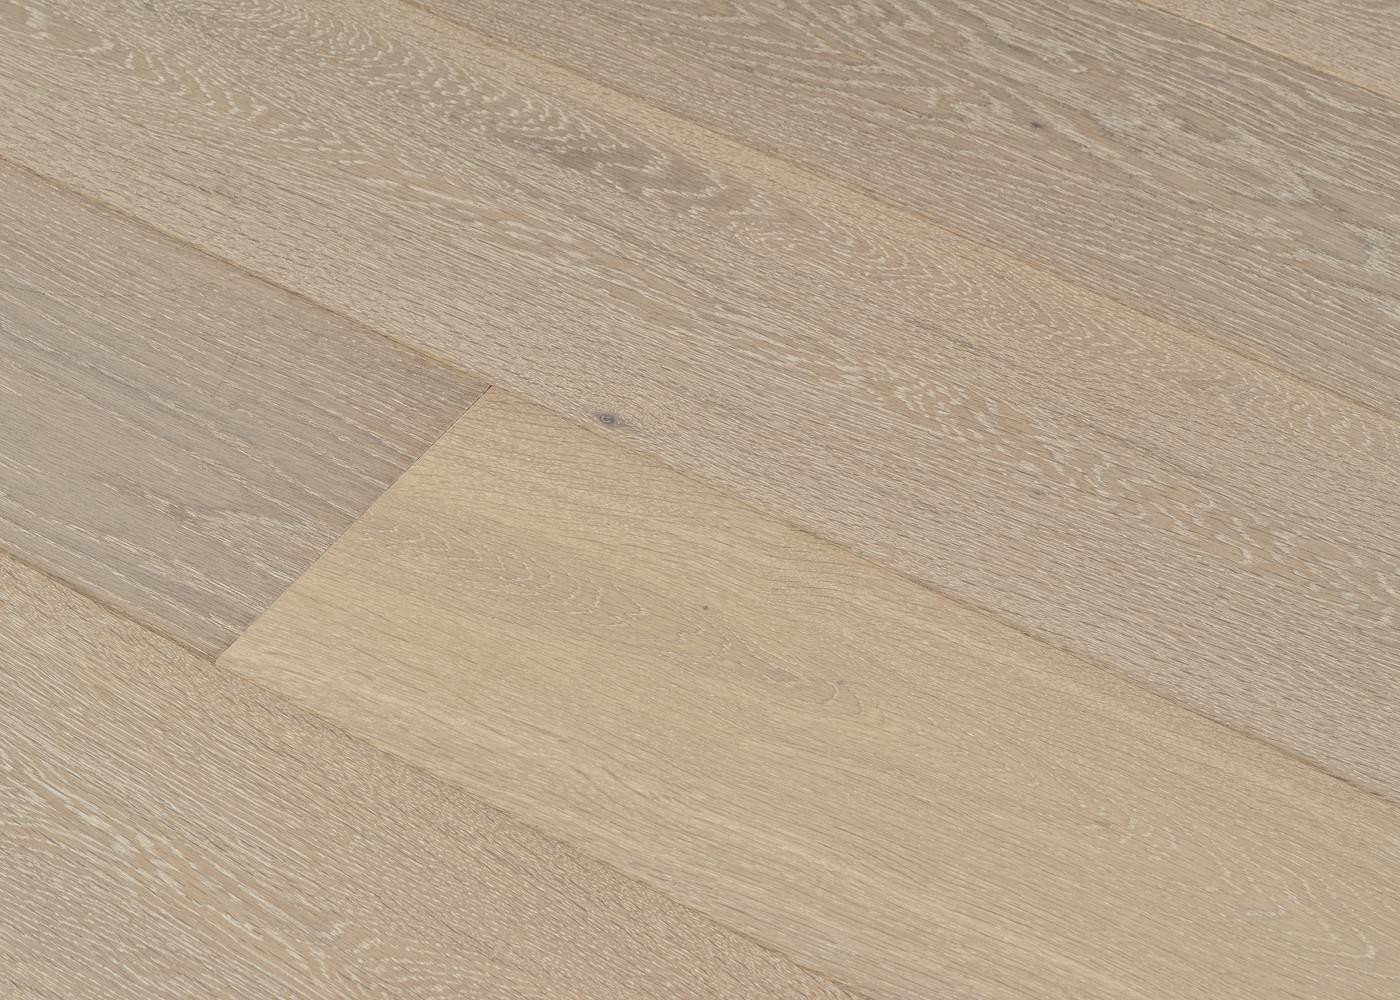 Parquet chêne contrecollé VANCOUVER vernis aqua ultra mat PRBis 14x148x2200